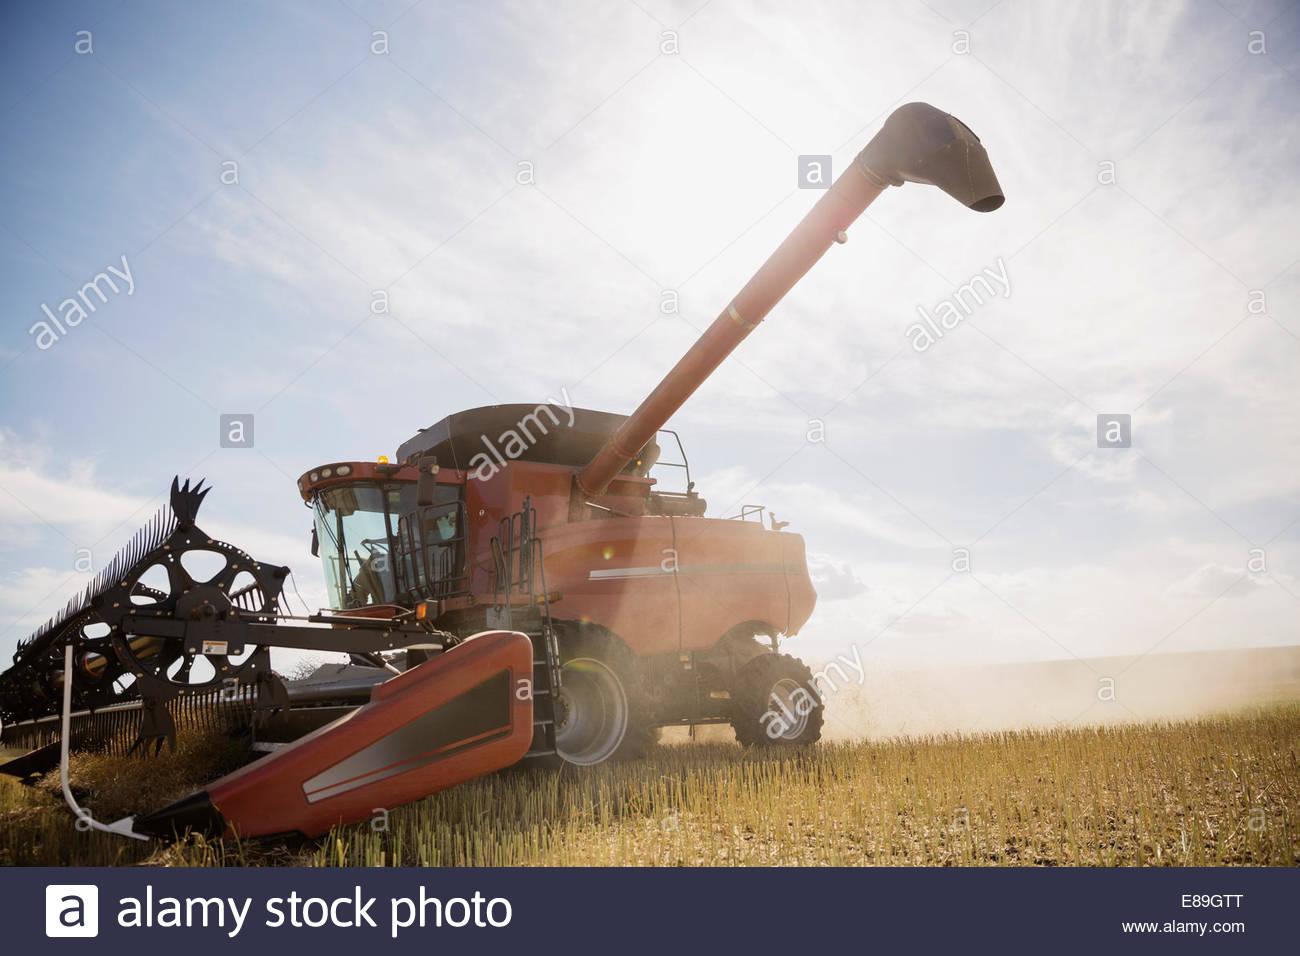 Combine harvester working in sunny crop field - Stock Image